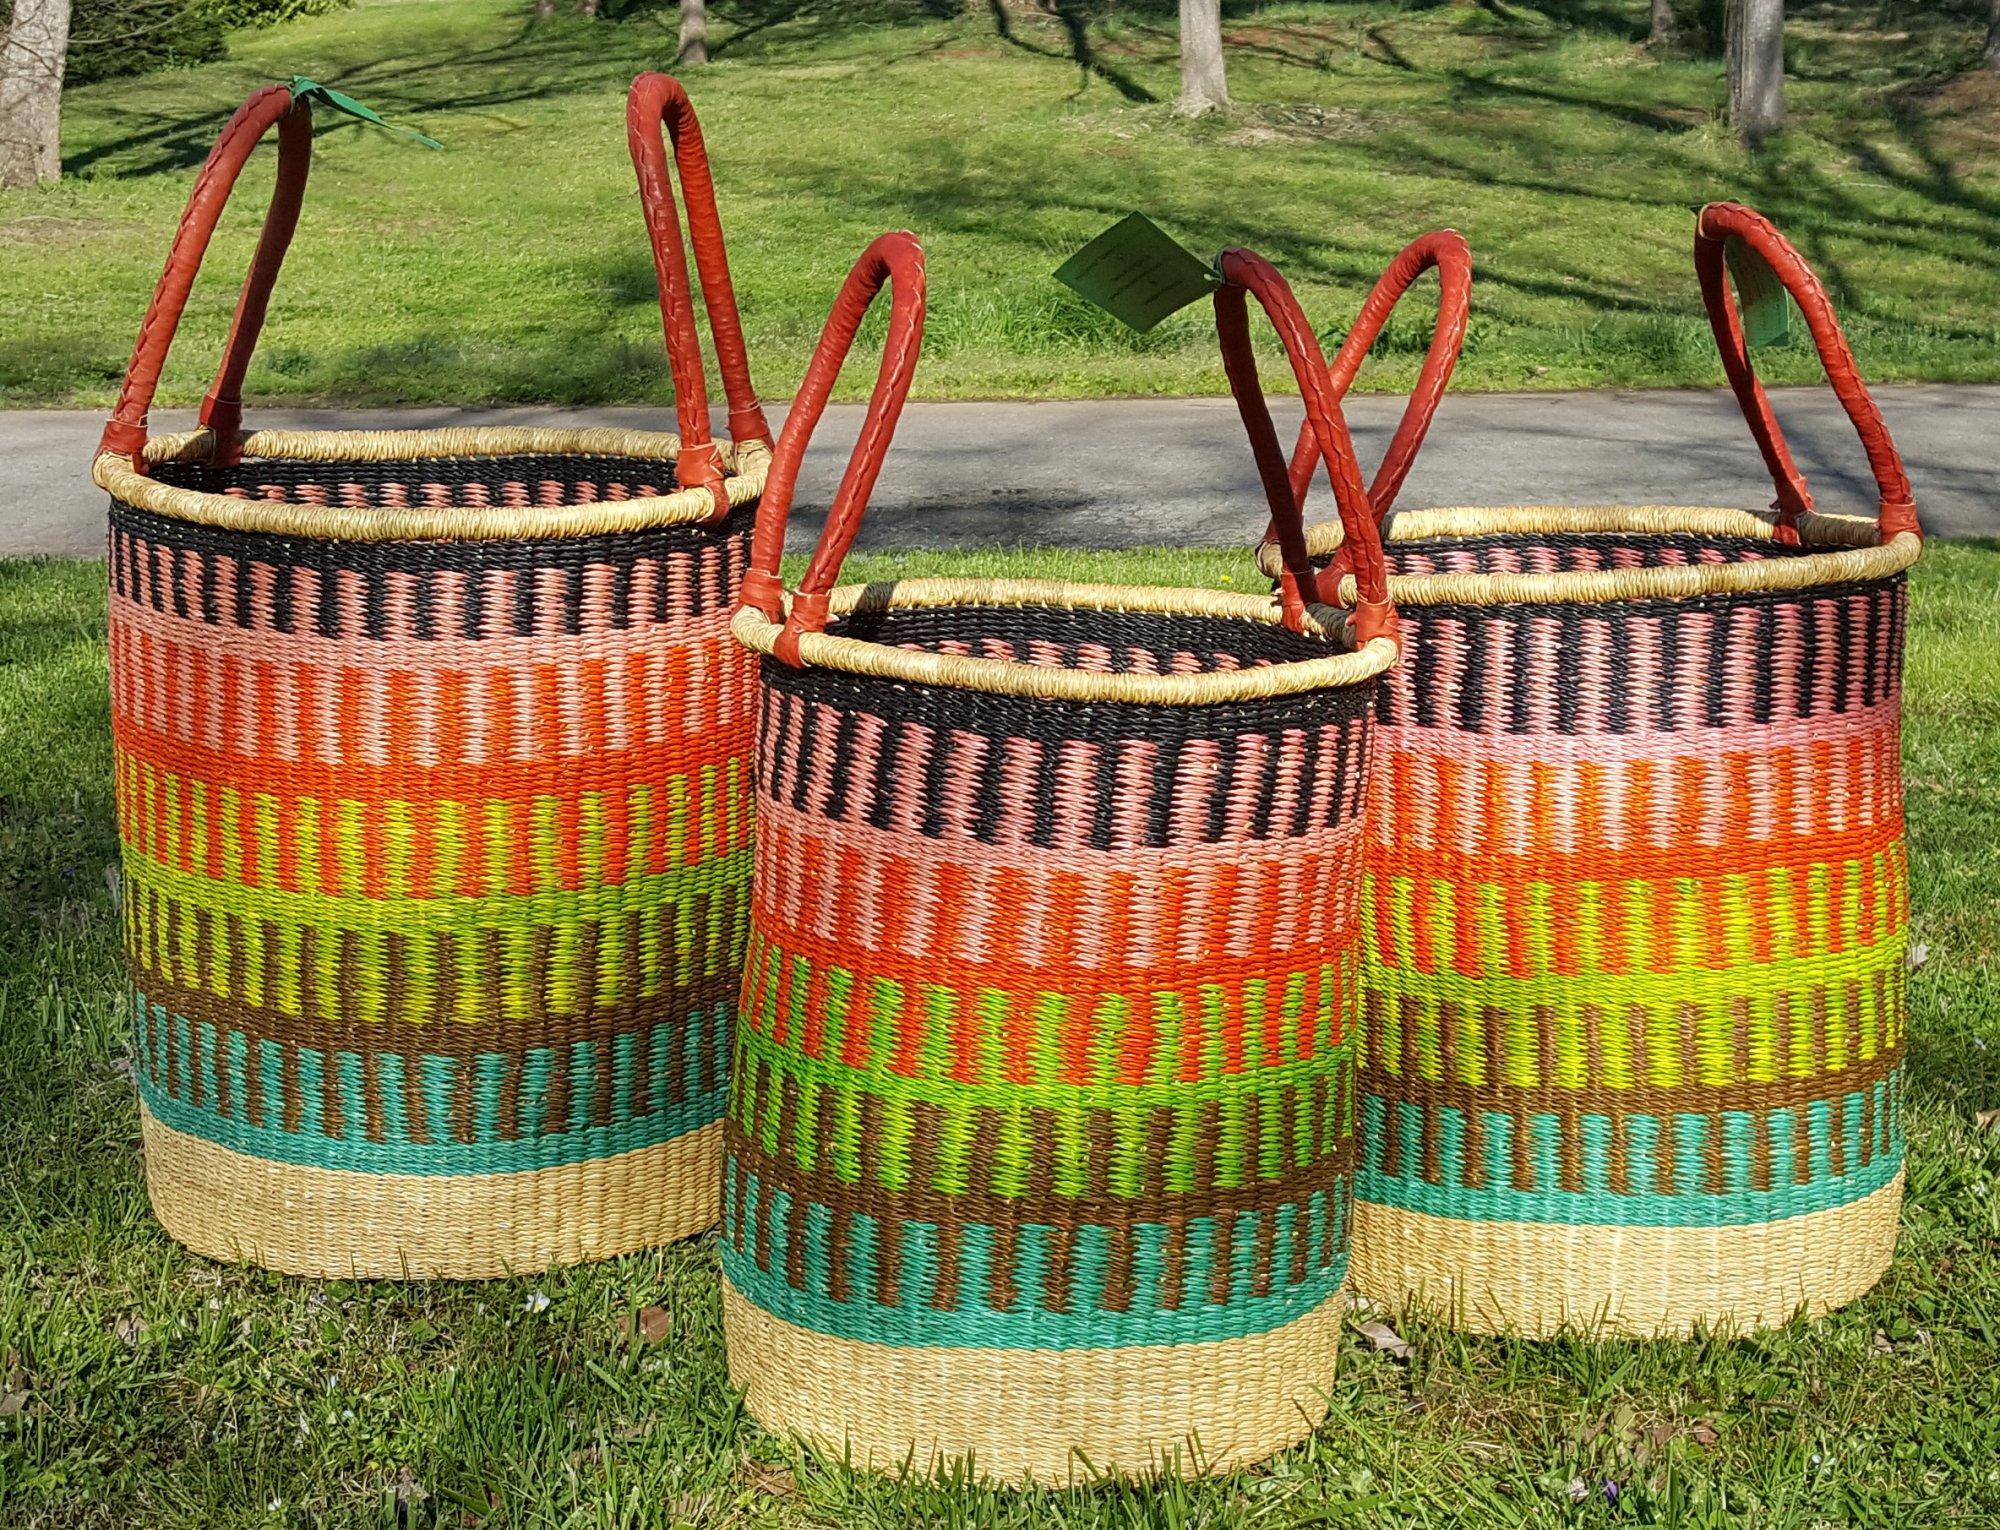 Ghana 2-Handled Multicolor Hampers (sold separately)